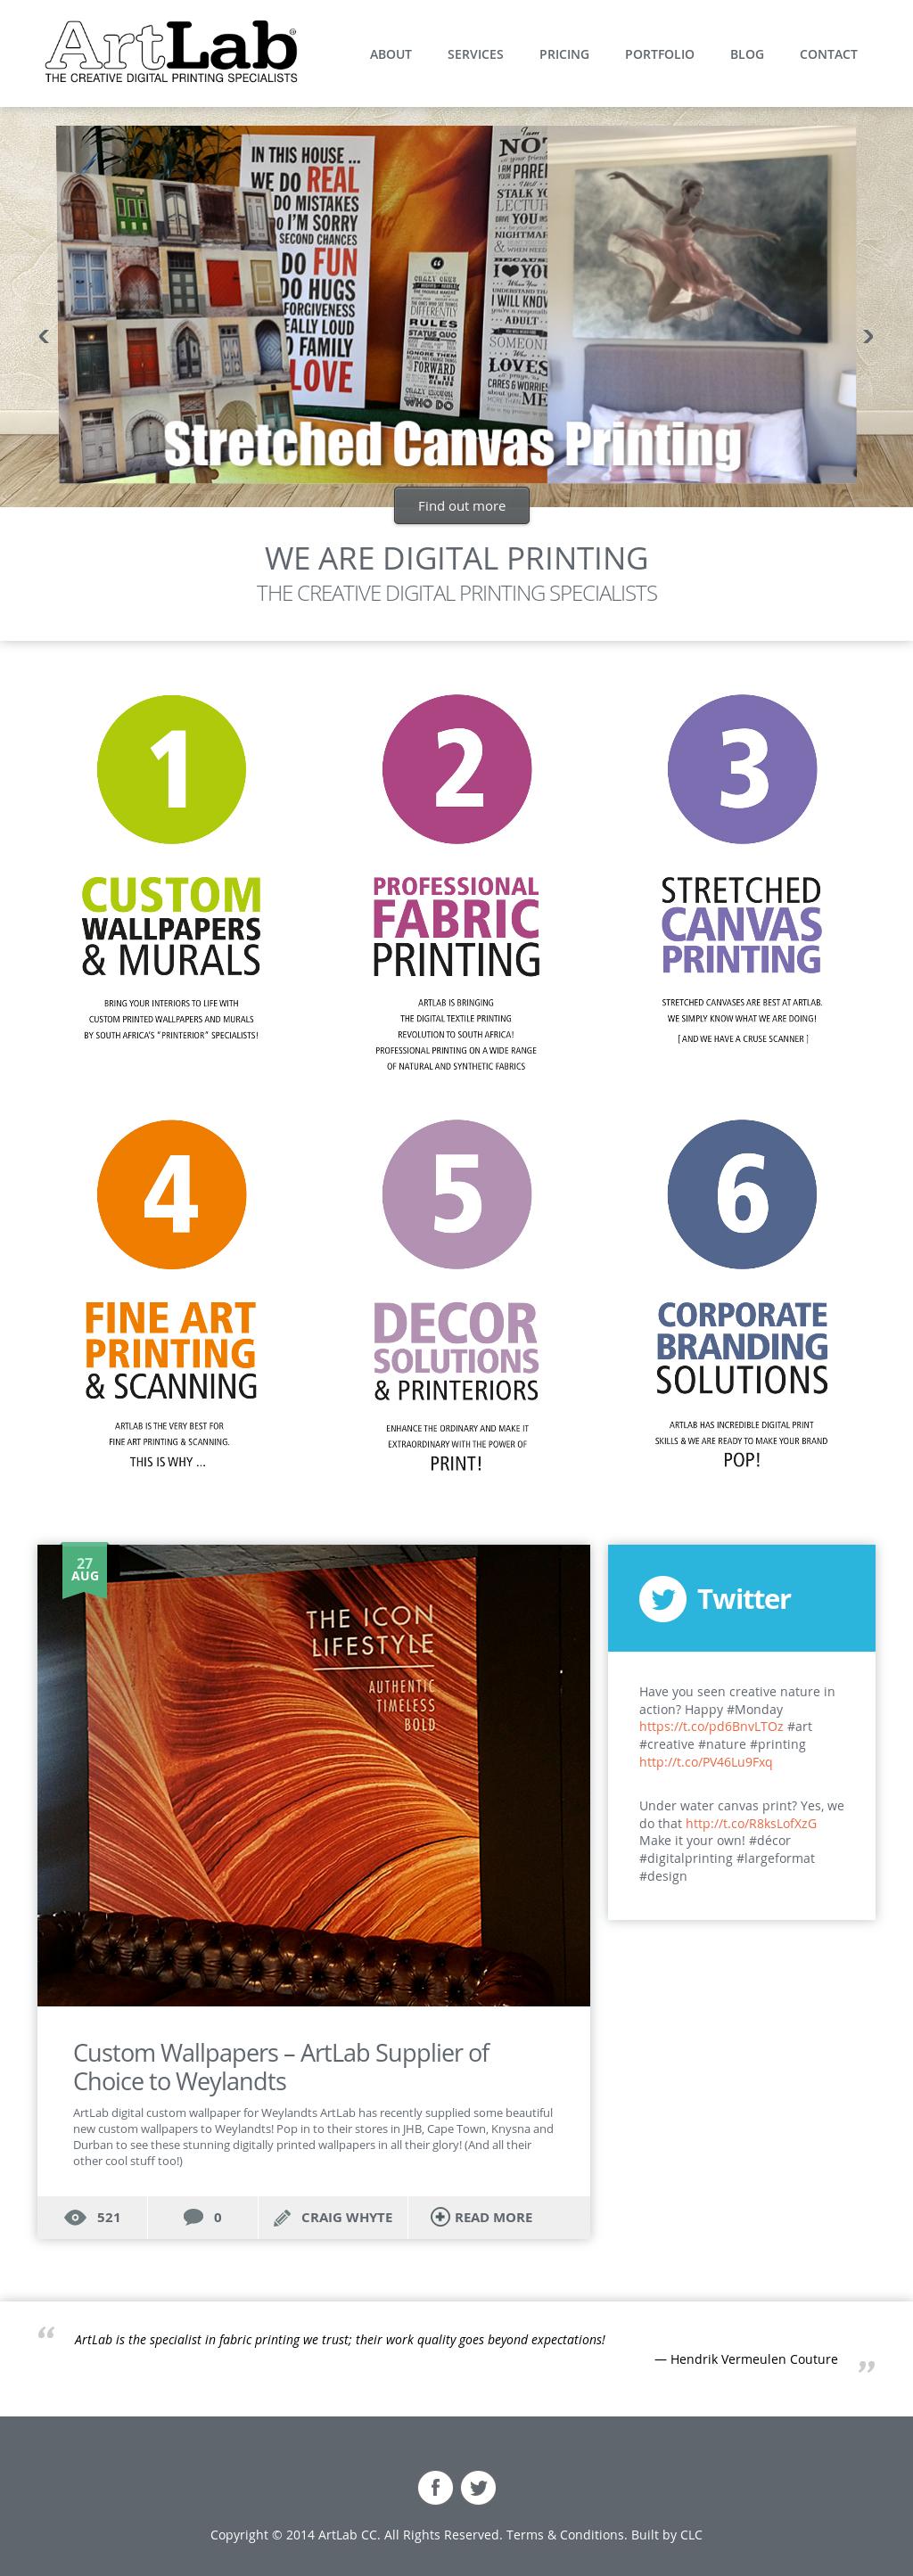 Artlab | Digital Printing & Scanning Competitors, Revenue